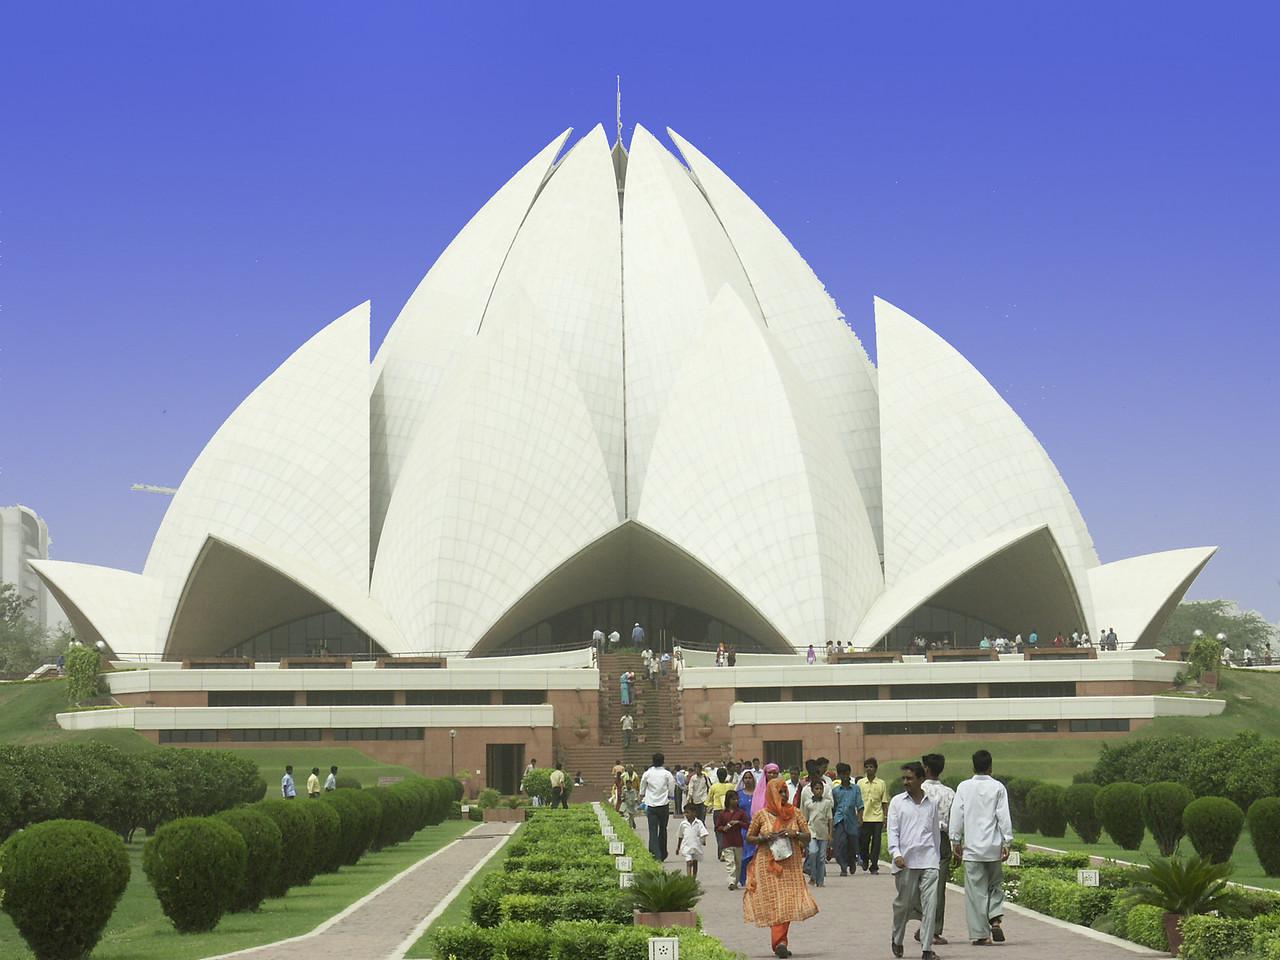 Delhi, India: The Ba'hai House of Workship